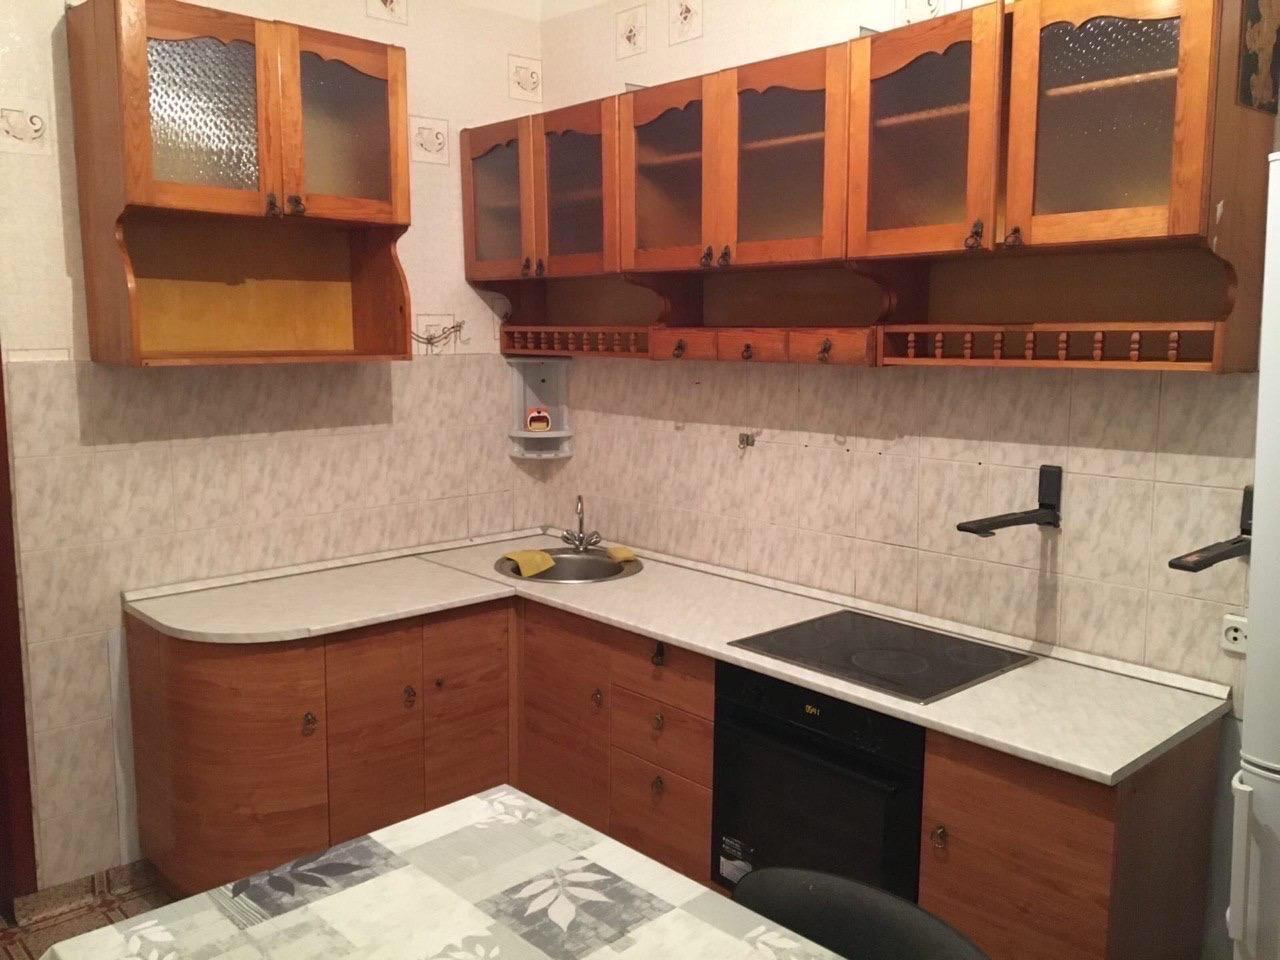 2к квартира Астраханская улица, 10 | 17000 | аренда в Красноярске фото 5